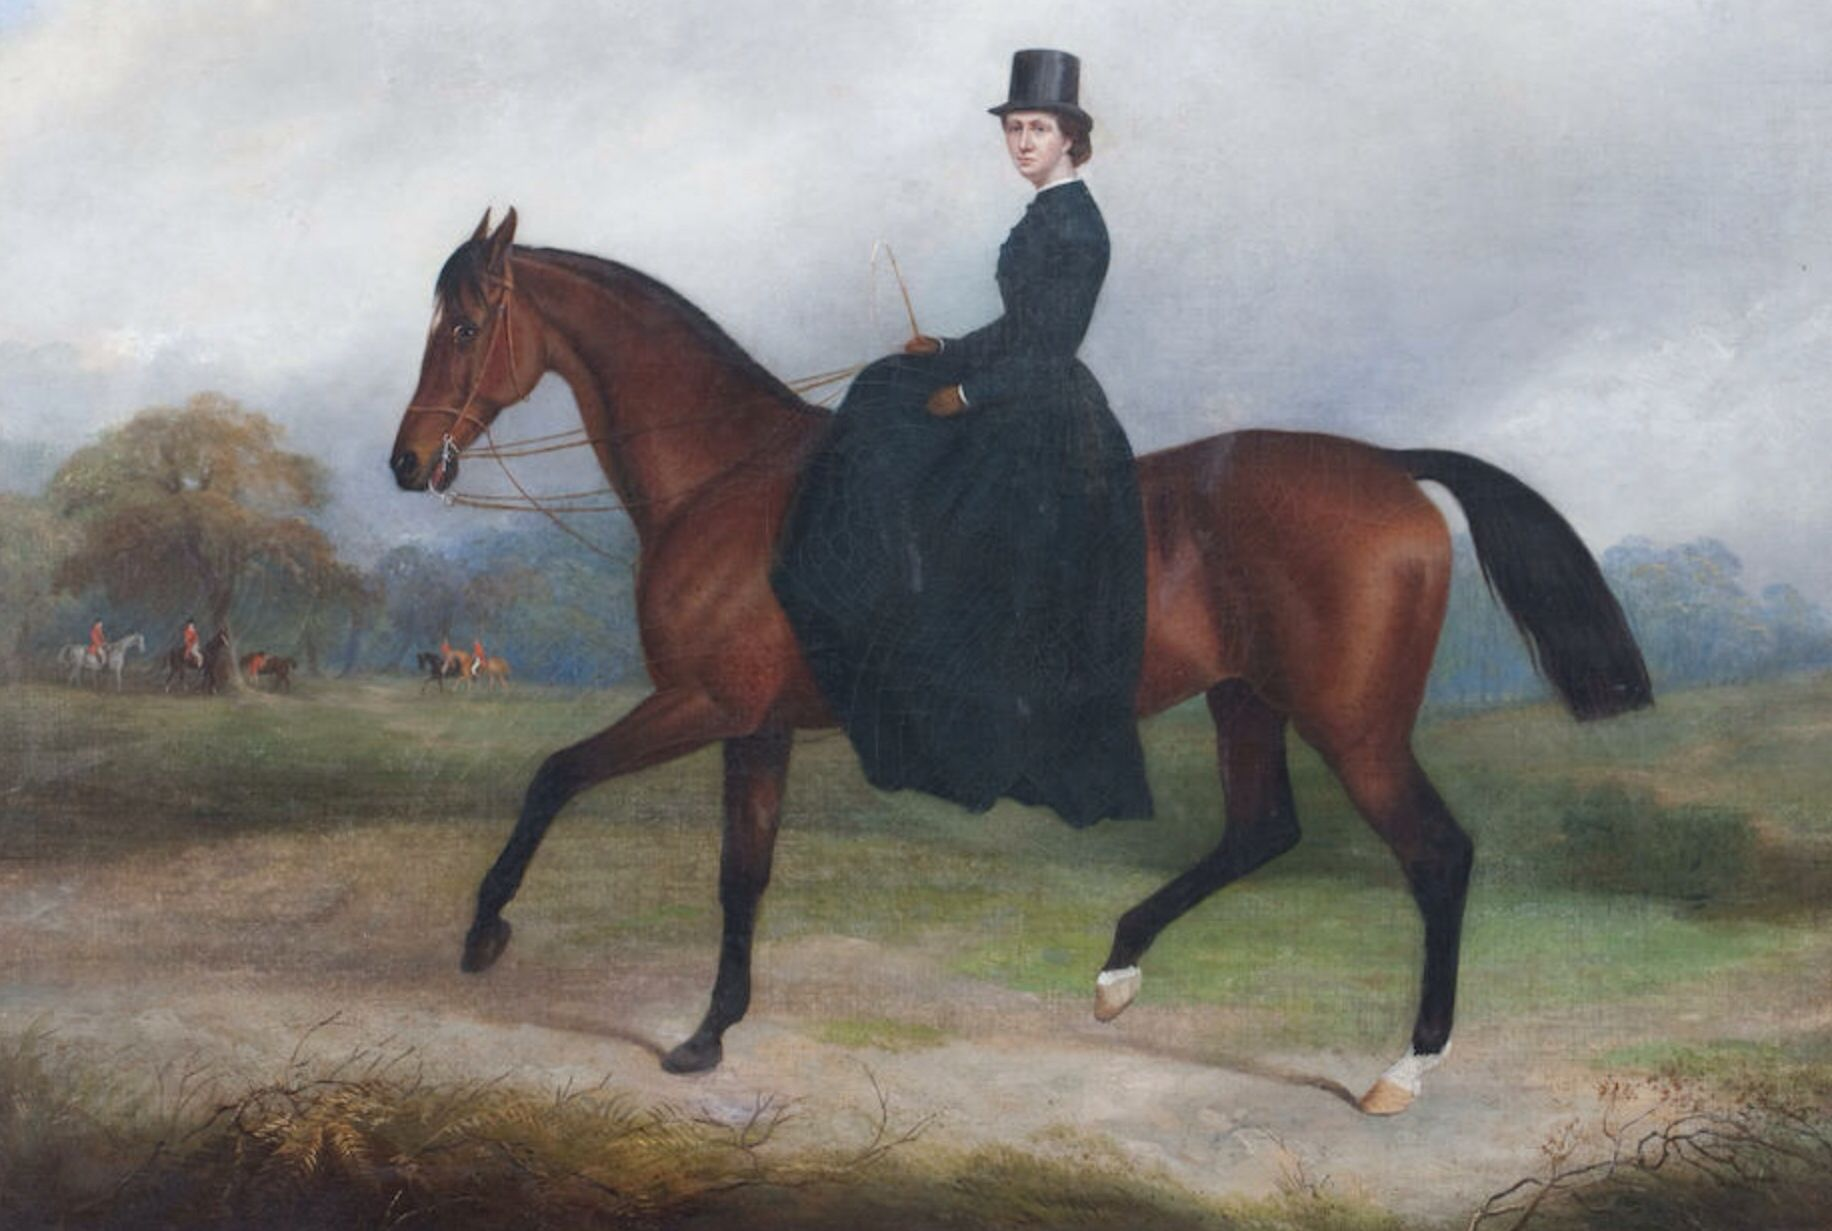 Lady on Horseback by John Paul